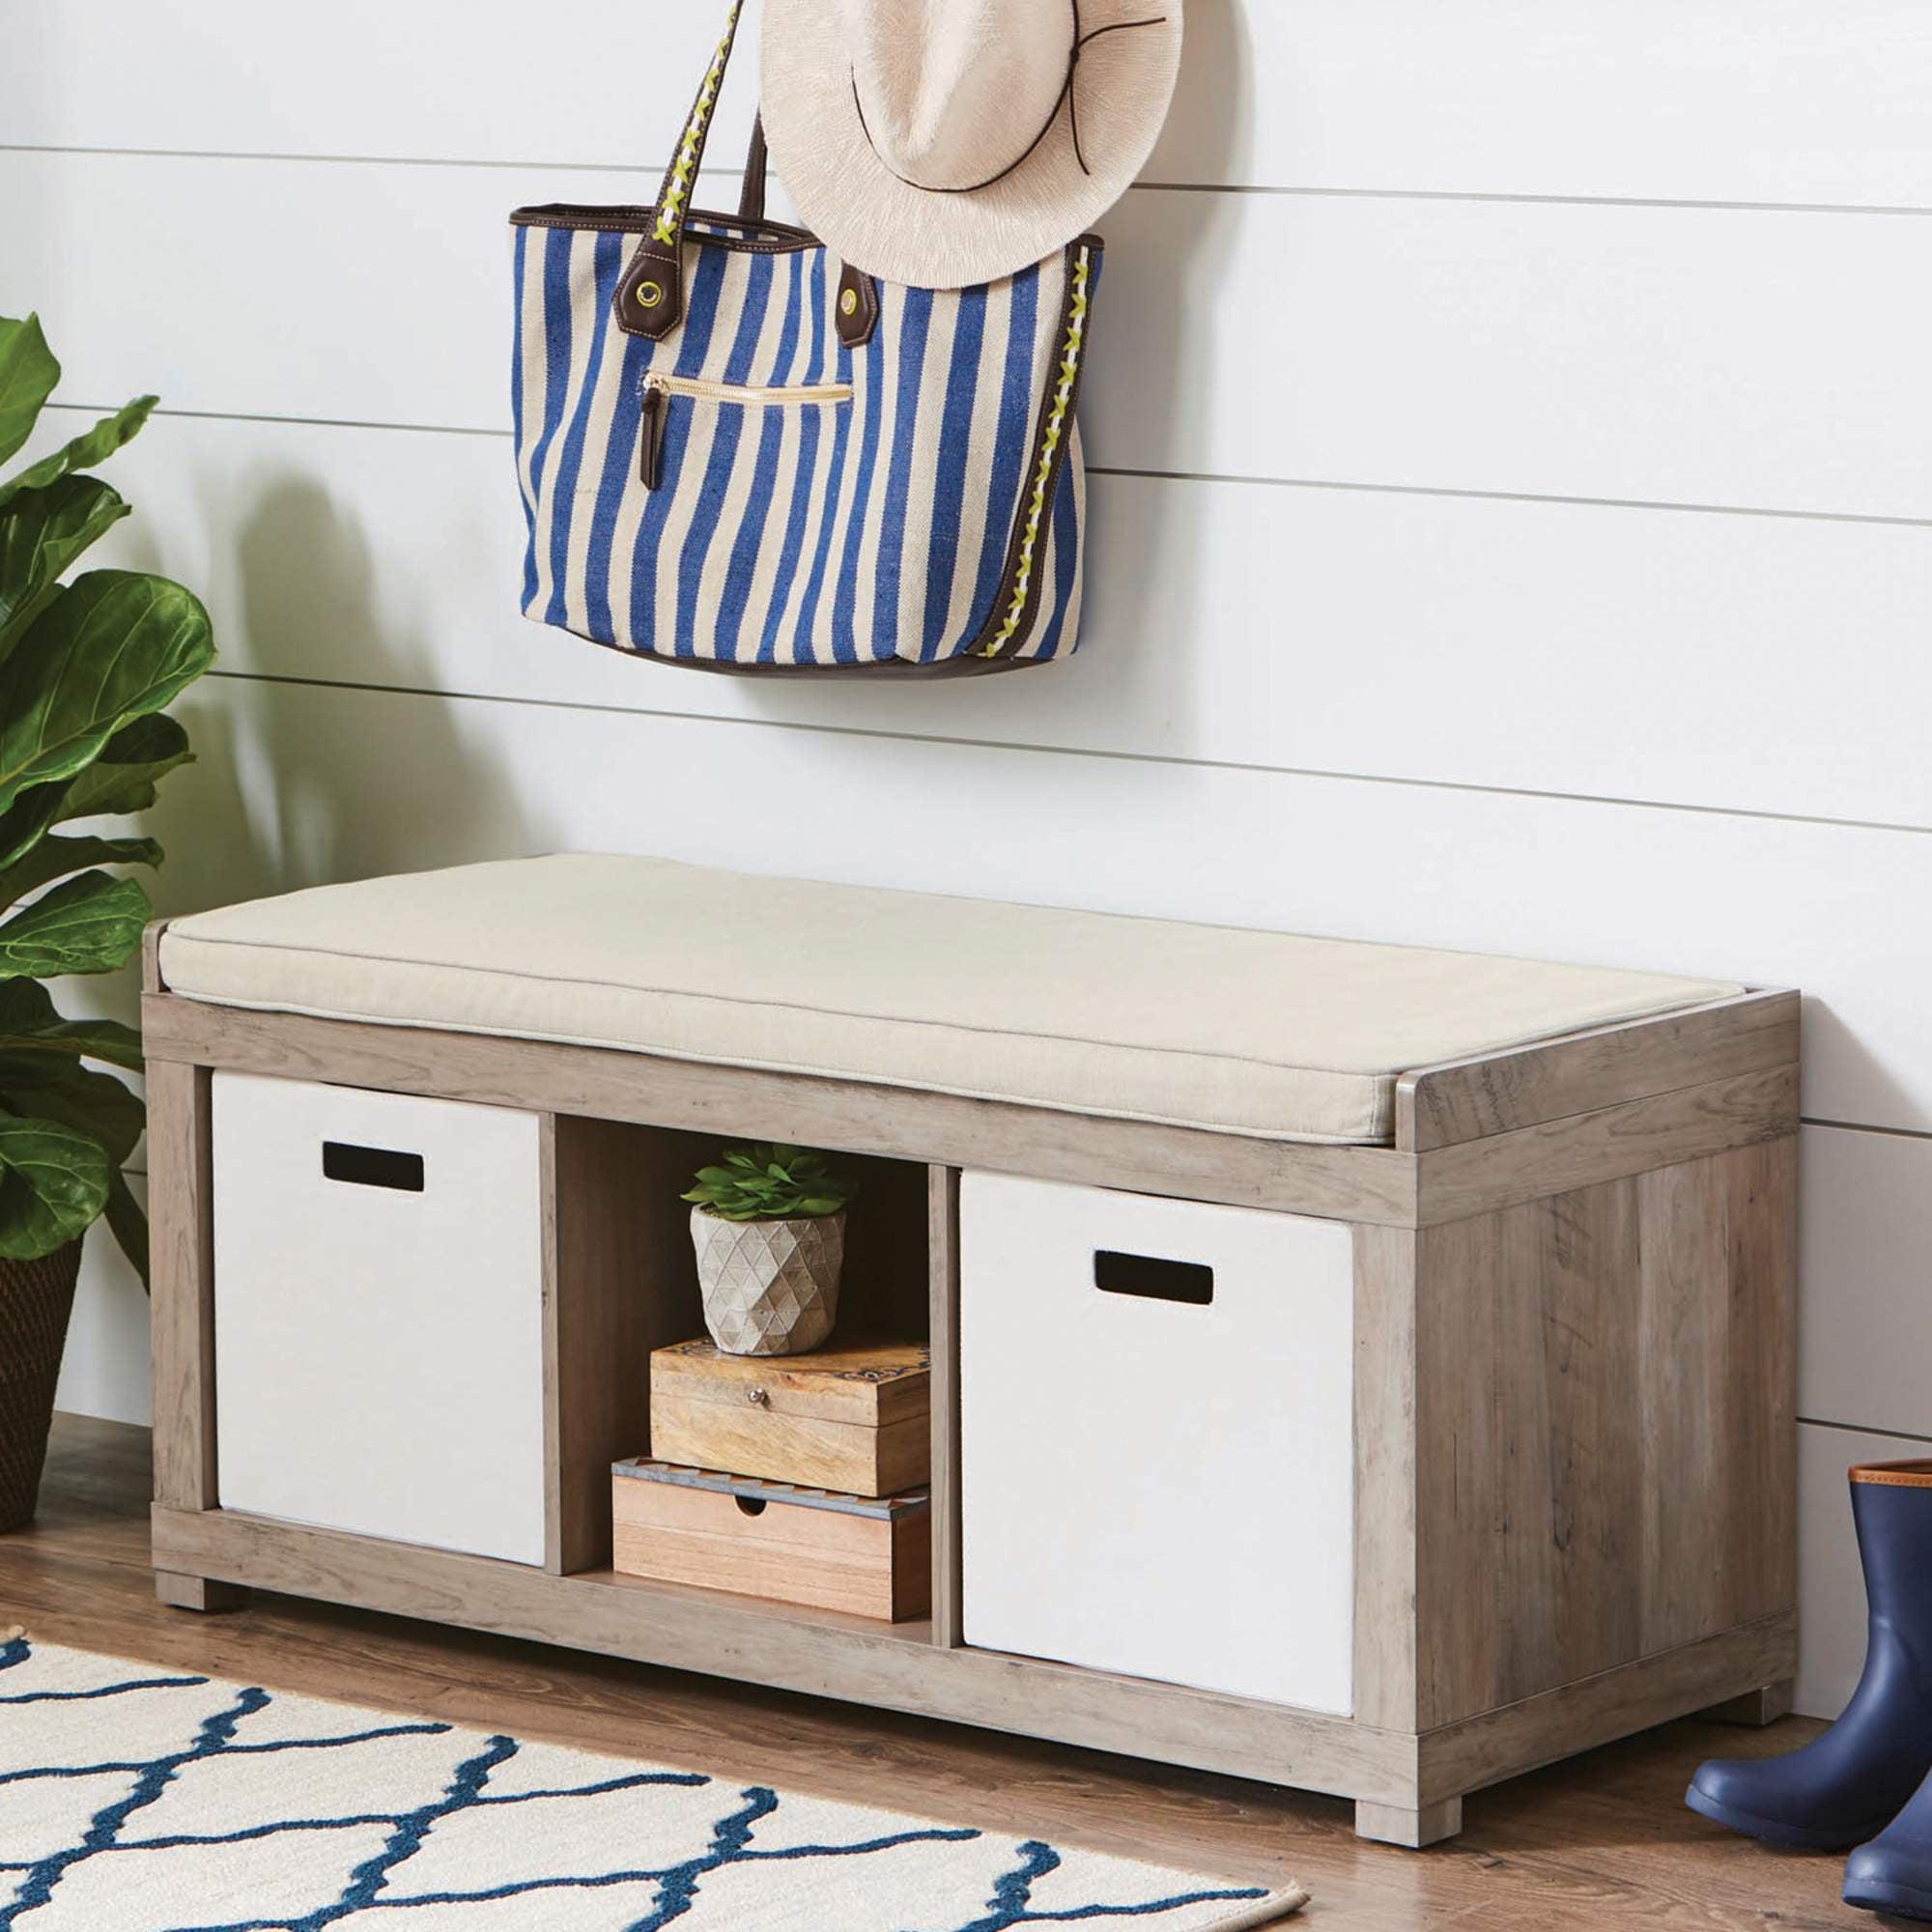 Better Homes And Gardens 3 Cube Organizer Storage Bench Rustic Gray Walmart Com Walmart Com